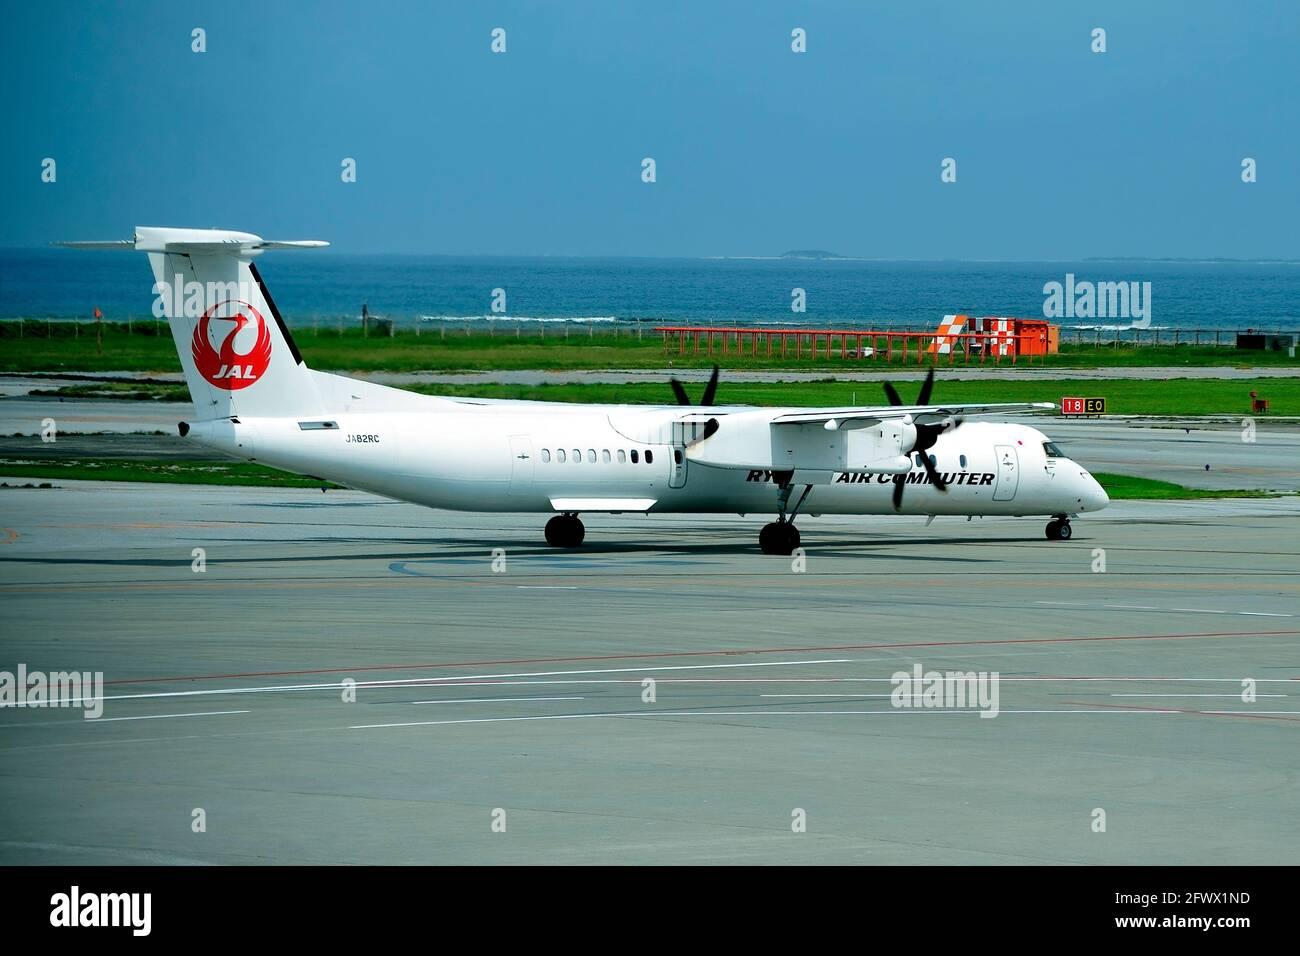 Ryukyu Air Commuter, RAC, De Havilland Canada Dash 8, DHC-8-200, JA82RC, Taxiing,  For Departure, Naha Airport, Okinawa, Japan Stock Photo